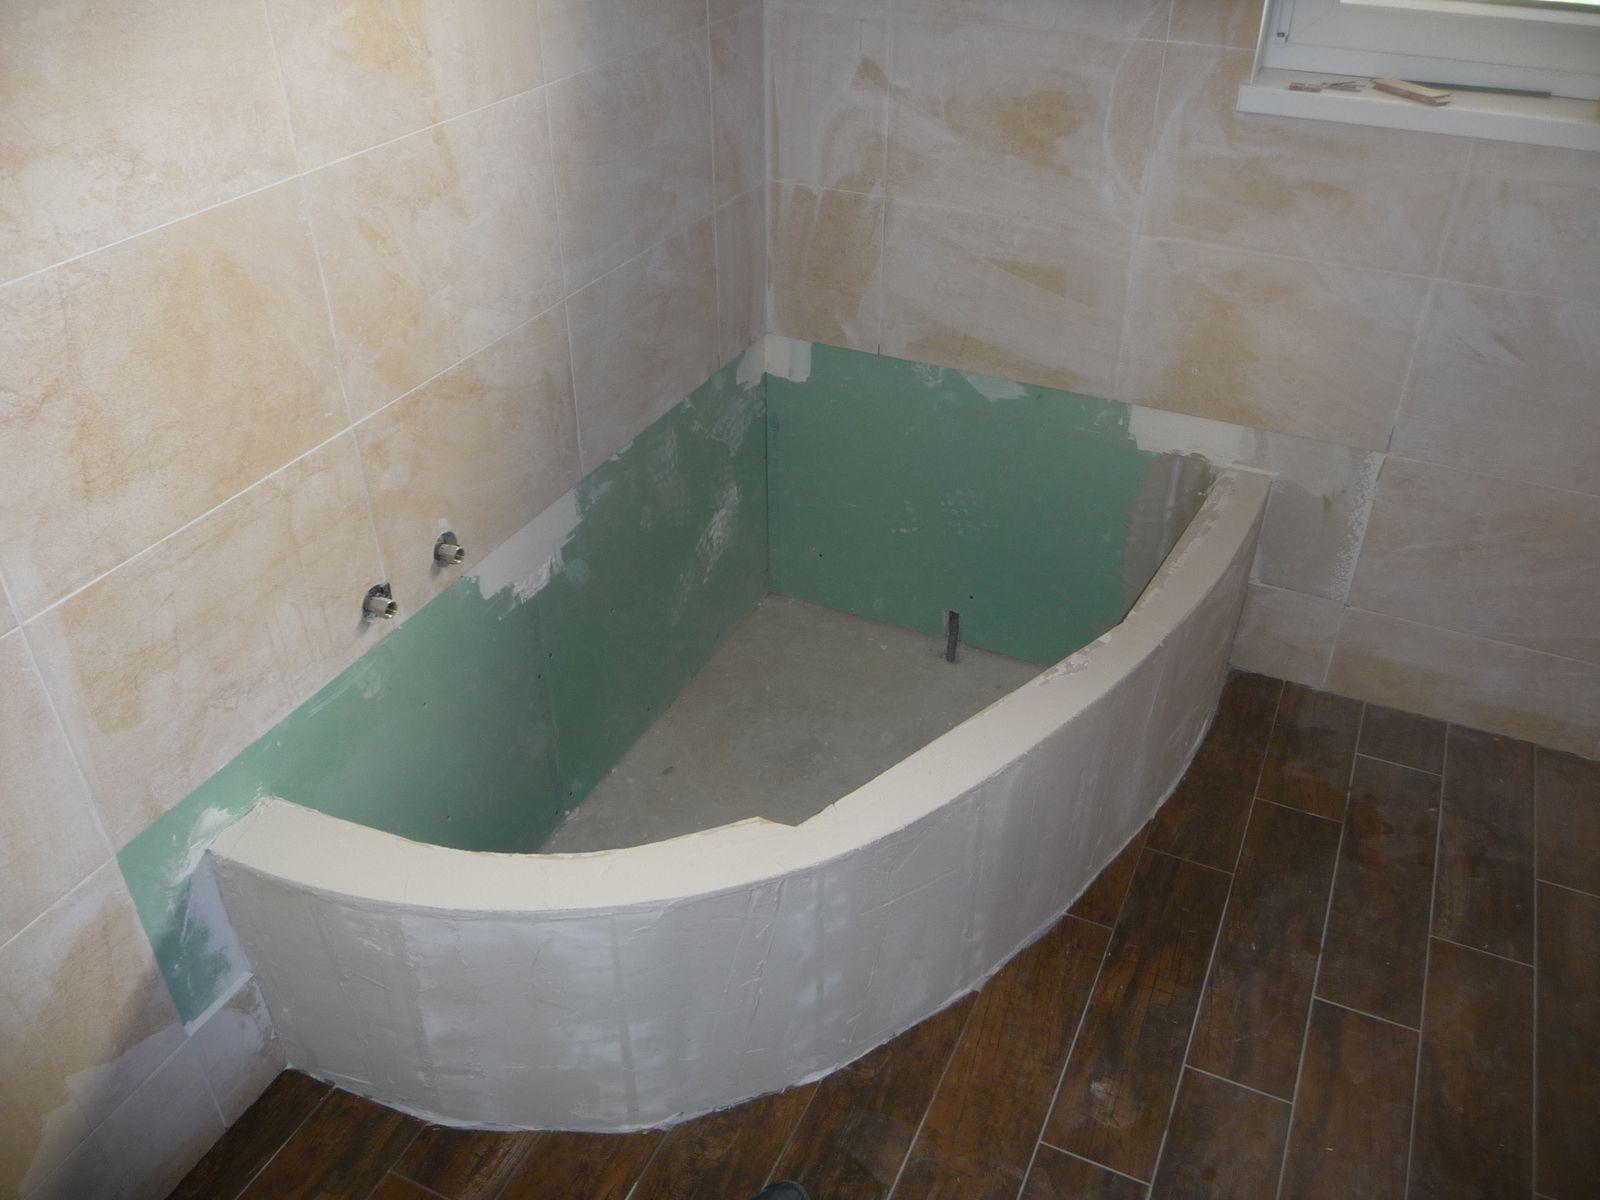 Fabriquer tablier baignoire innovant tablier baignoire for Carreler une salle de bain avec baignoire